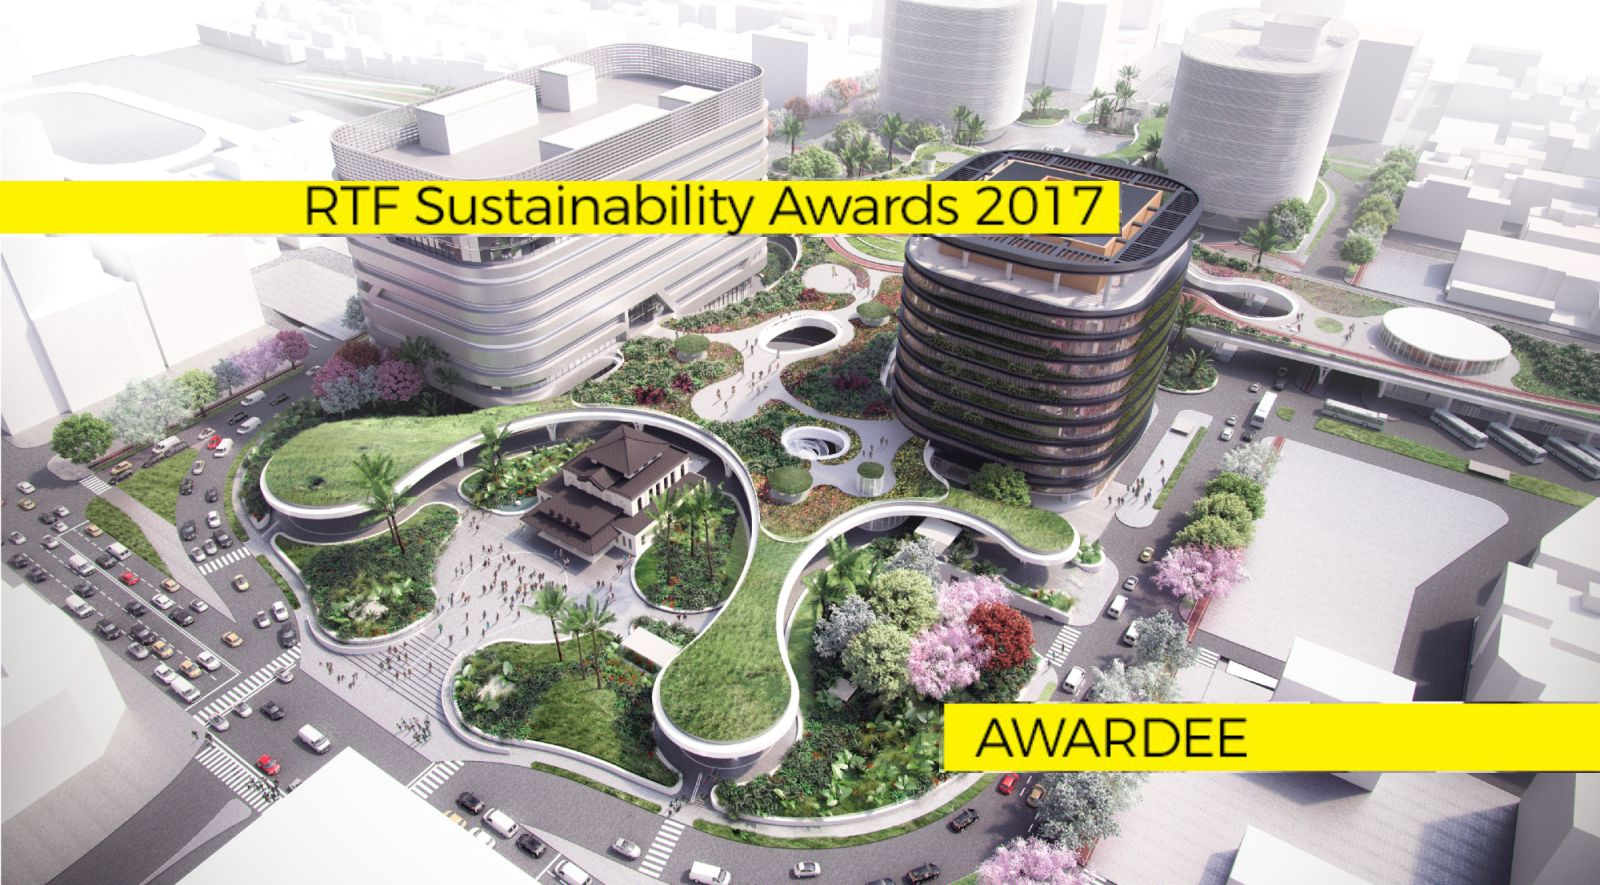 RTF Sustainability Awards